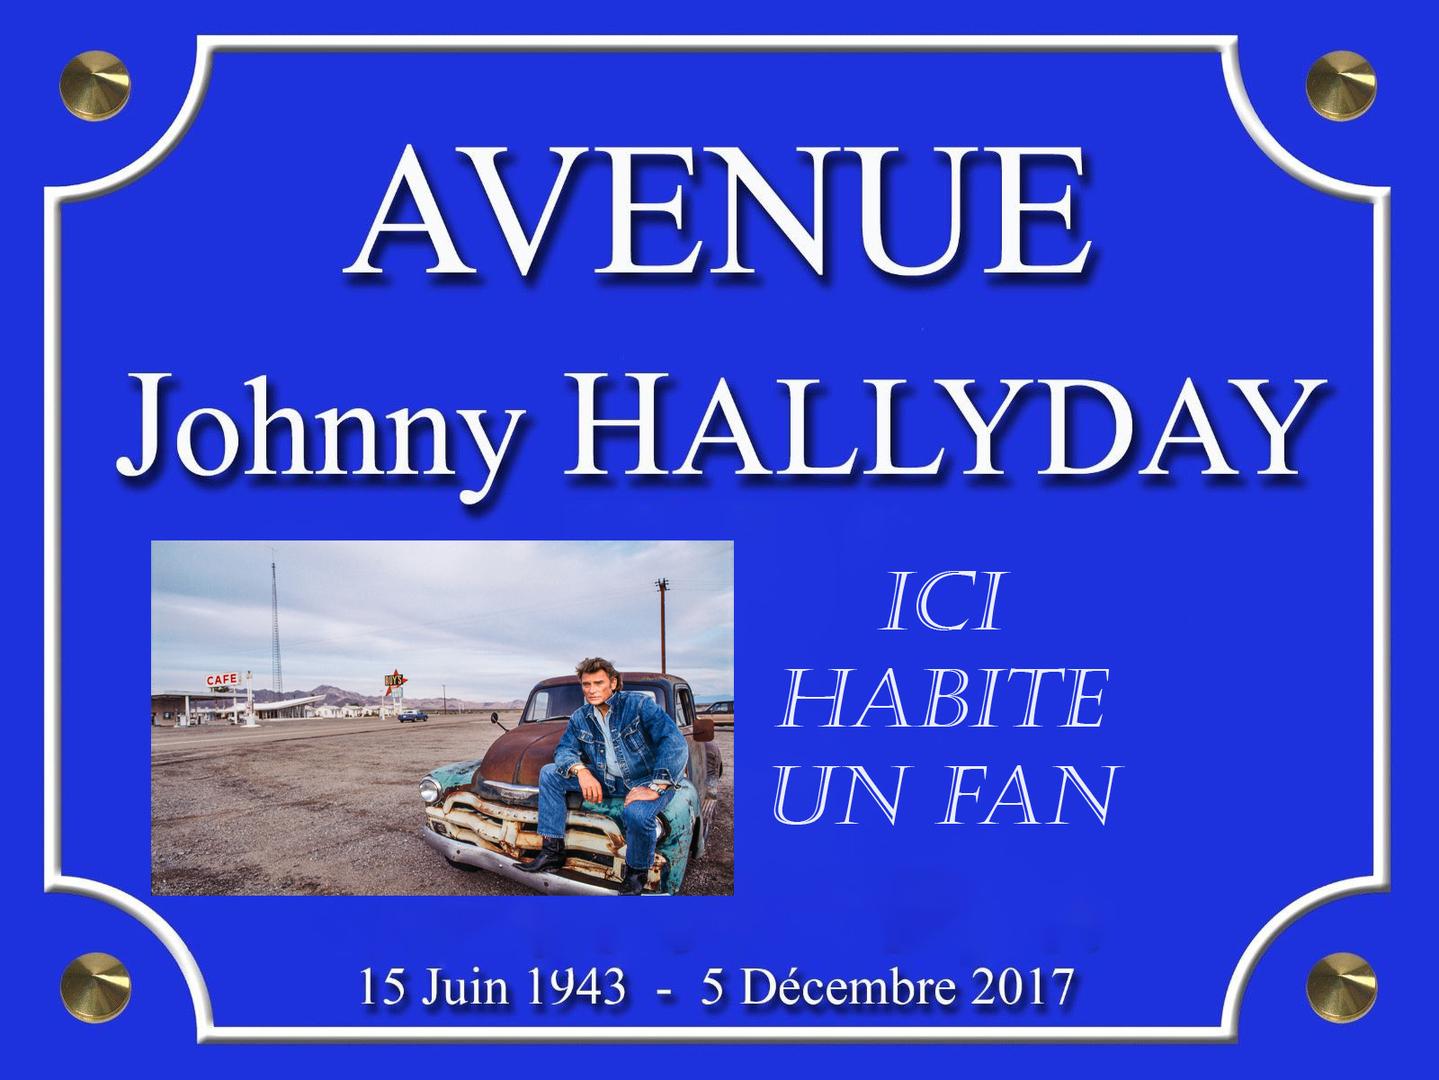 AVENUE Johnny HALLYDAY ICI HABITE UN FAN 4 X 4